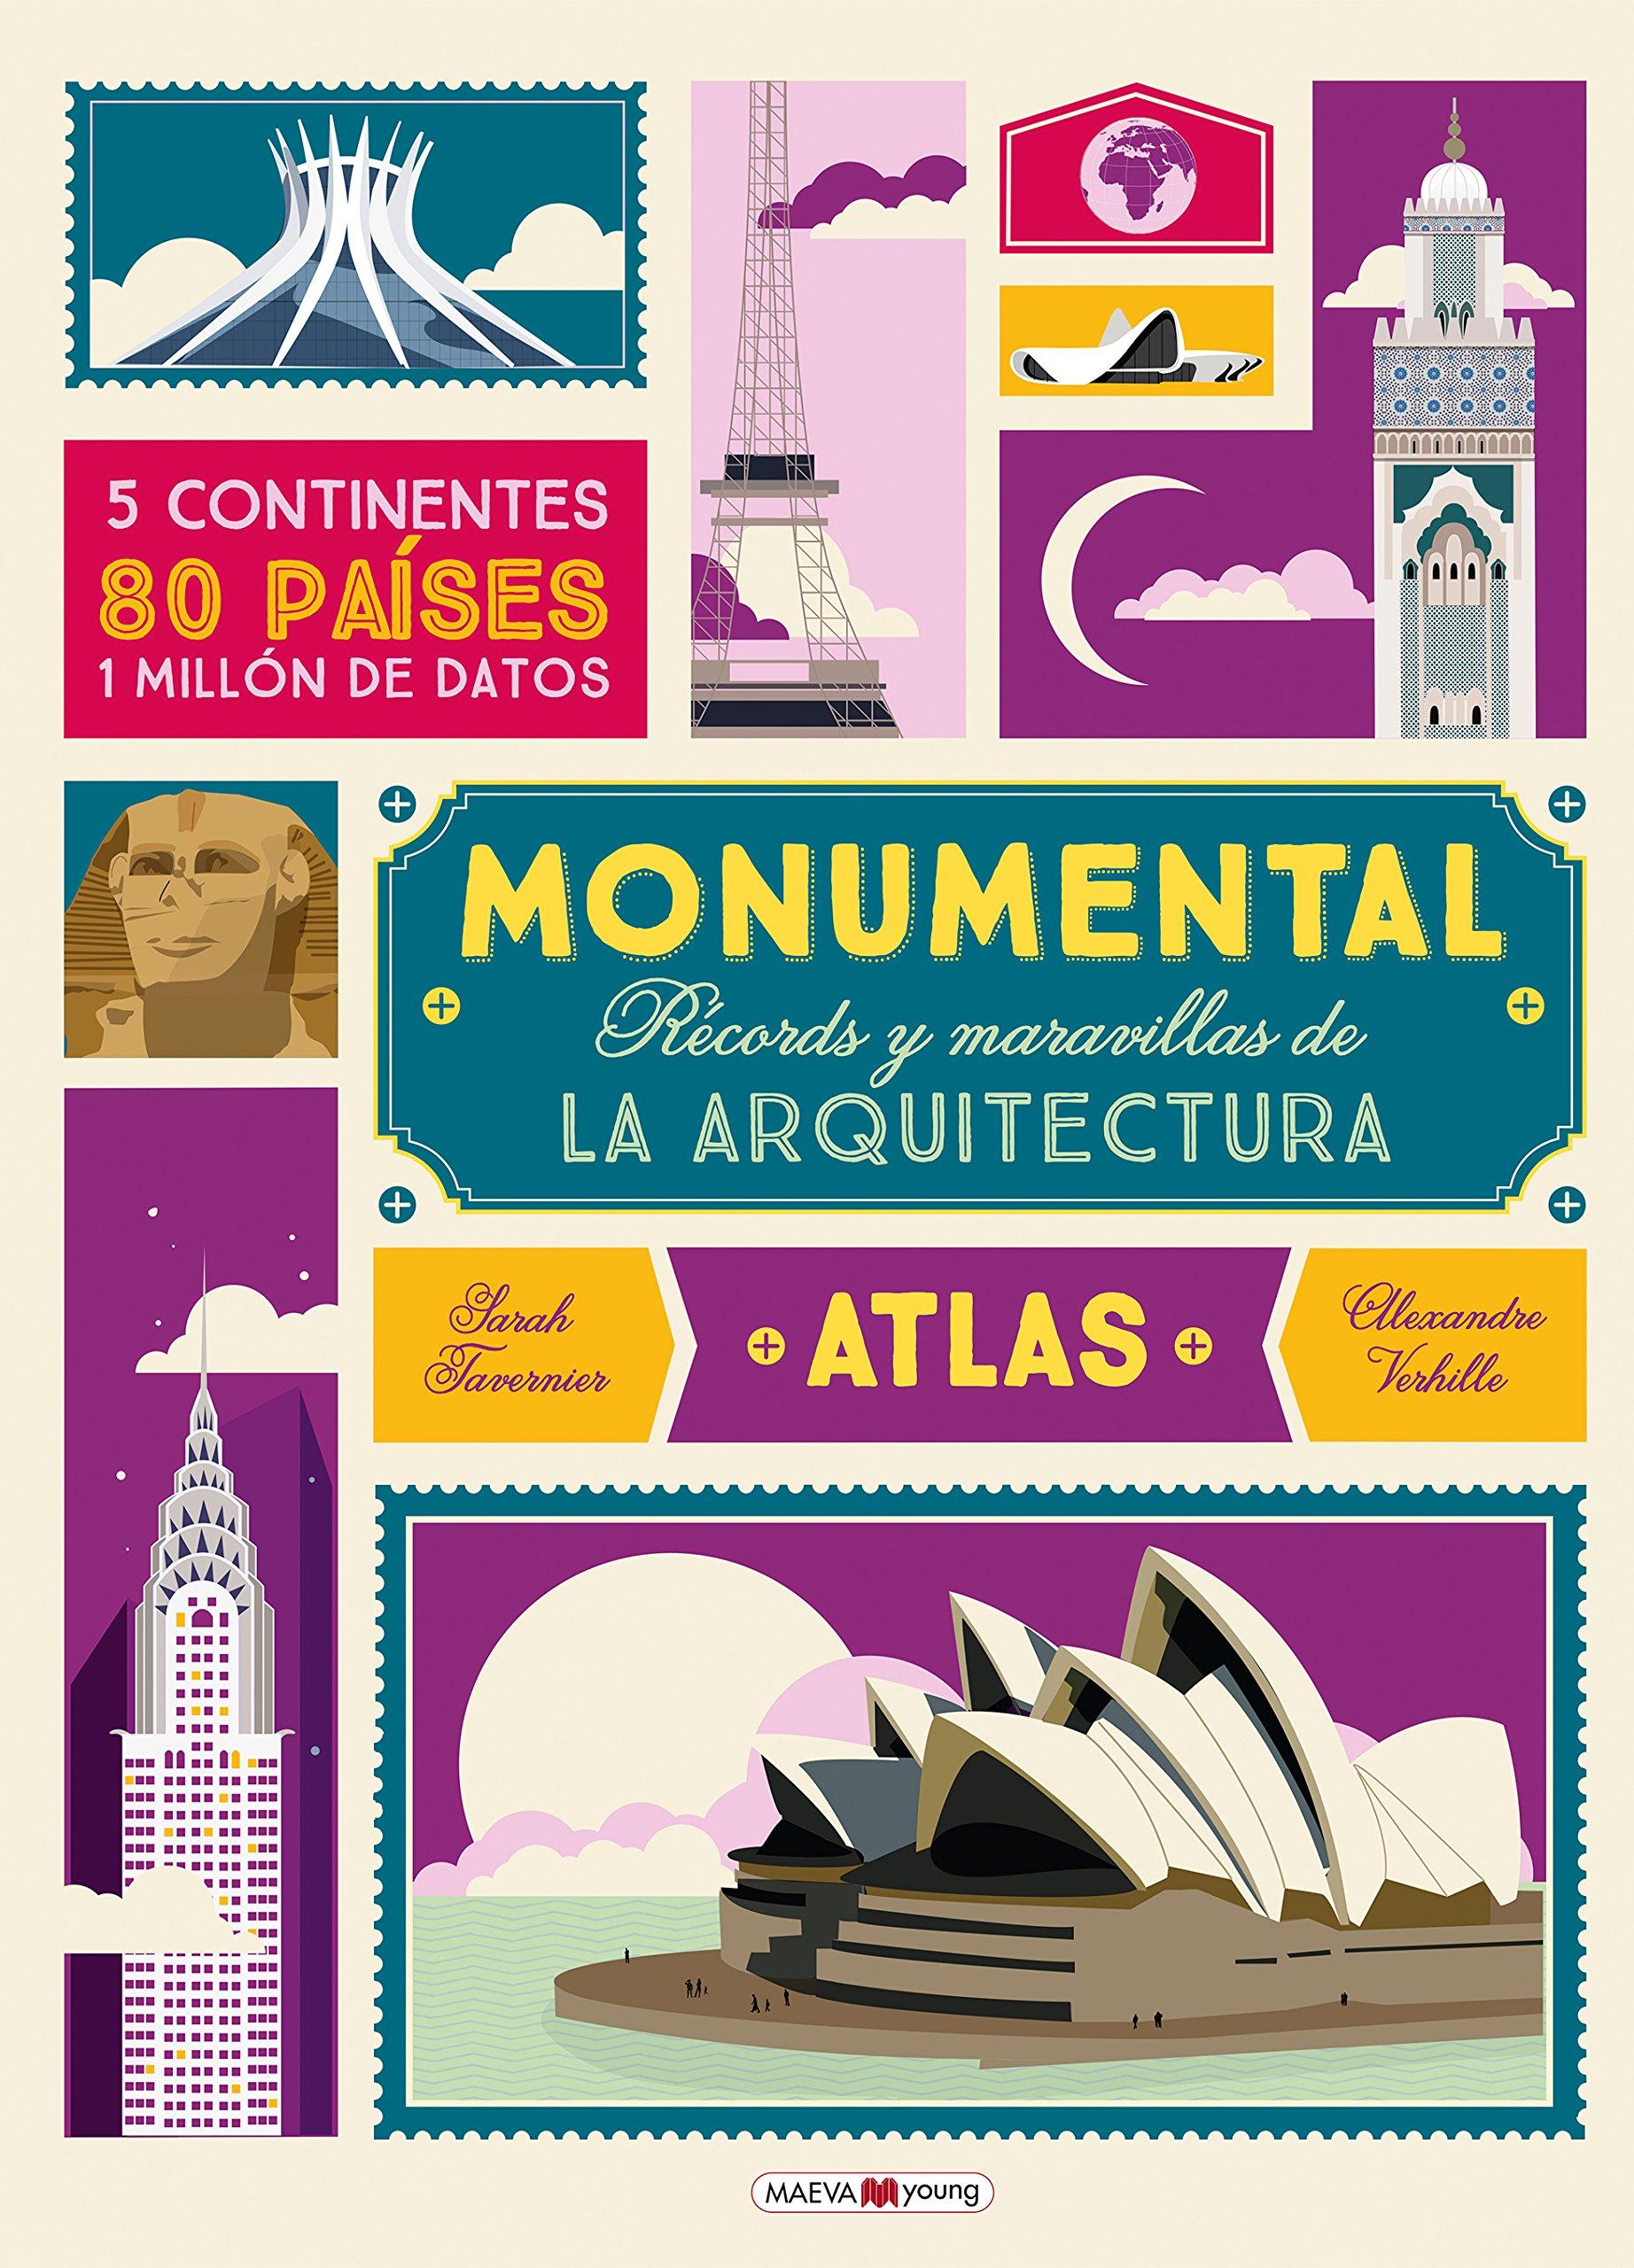 Monumental: Récords y maravillas del la arquitectura 14 3/4 inch x 10 3/4 inch (Spanish Edition) pdf